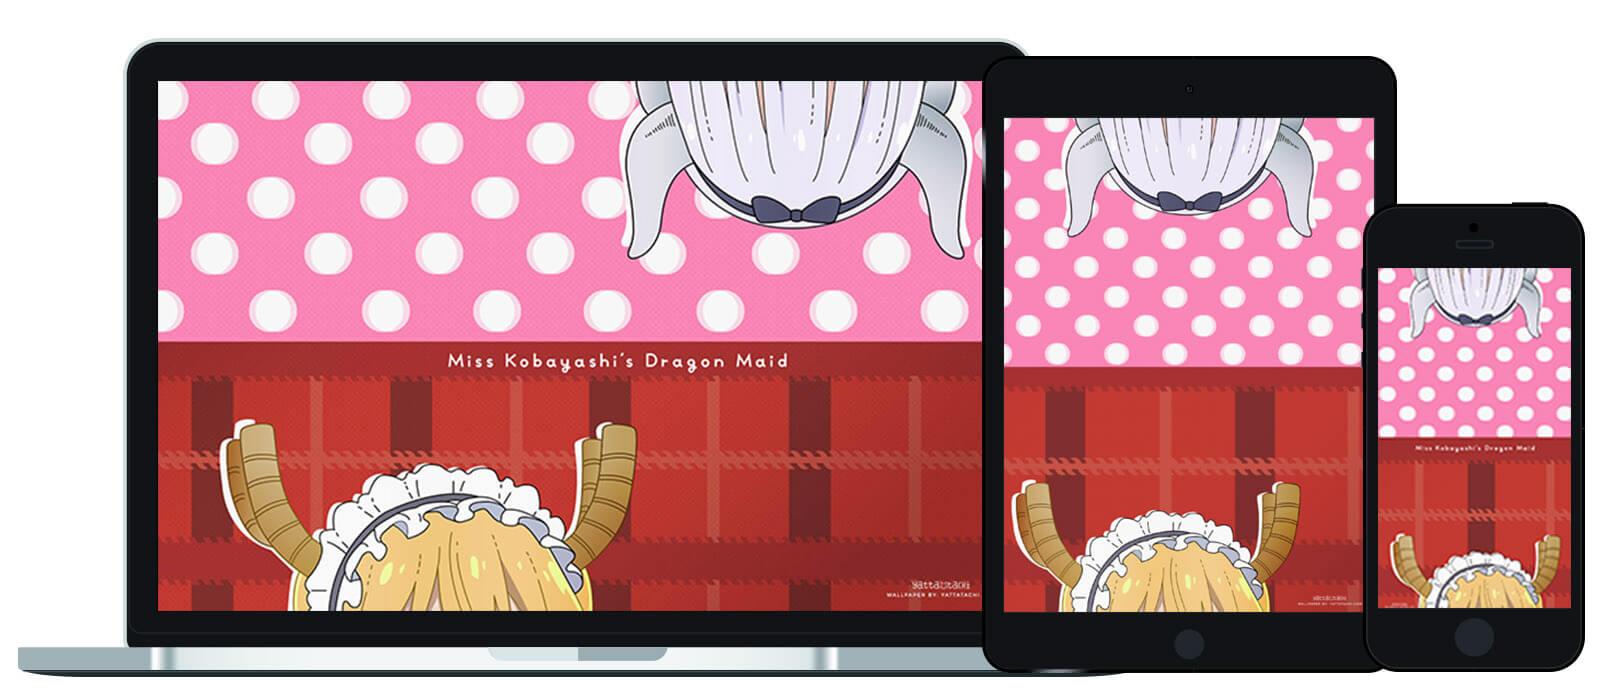 Wallpaper of the Month: Miss Kobayashi's Dragon Maid (Tohru & Kanna)